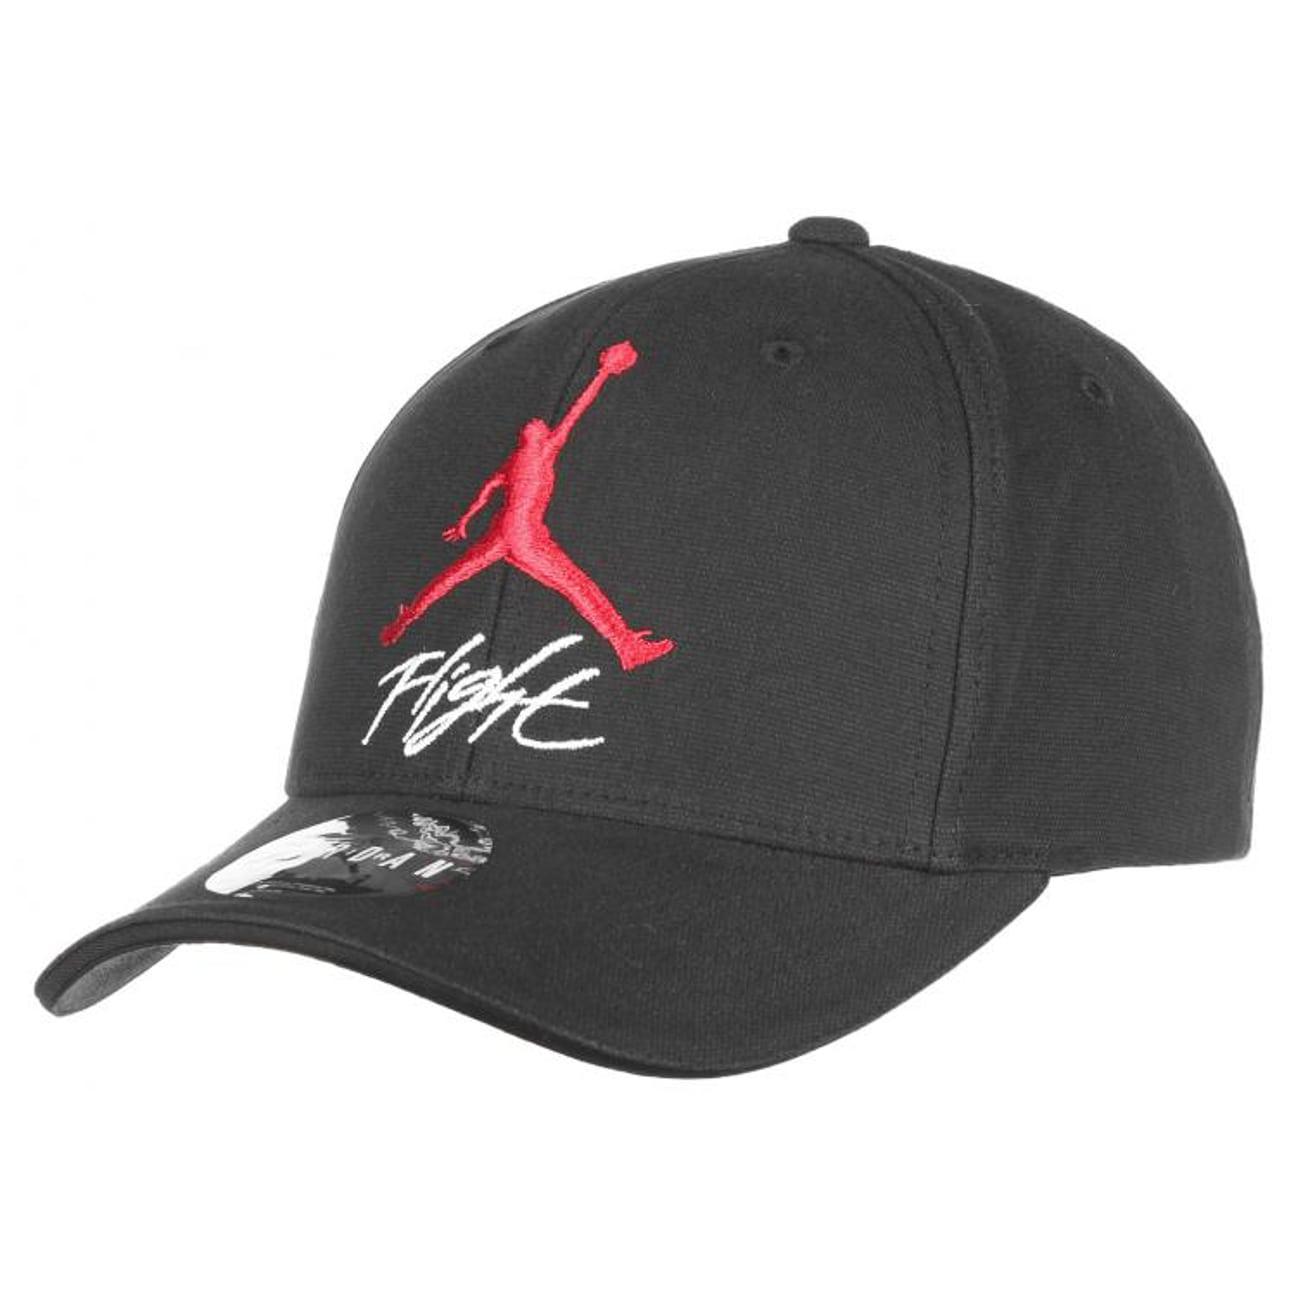 Gorra de Béisbol Michael Jordan by Nike - Gorras - sombreroshop.es 96d2cd24b16